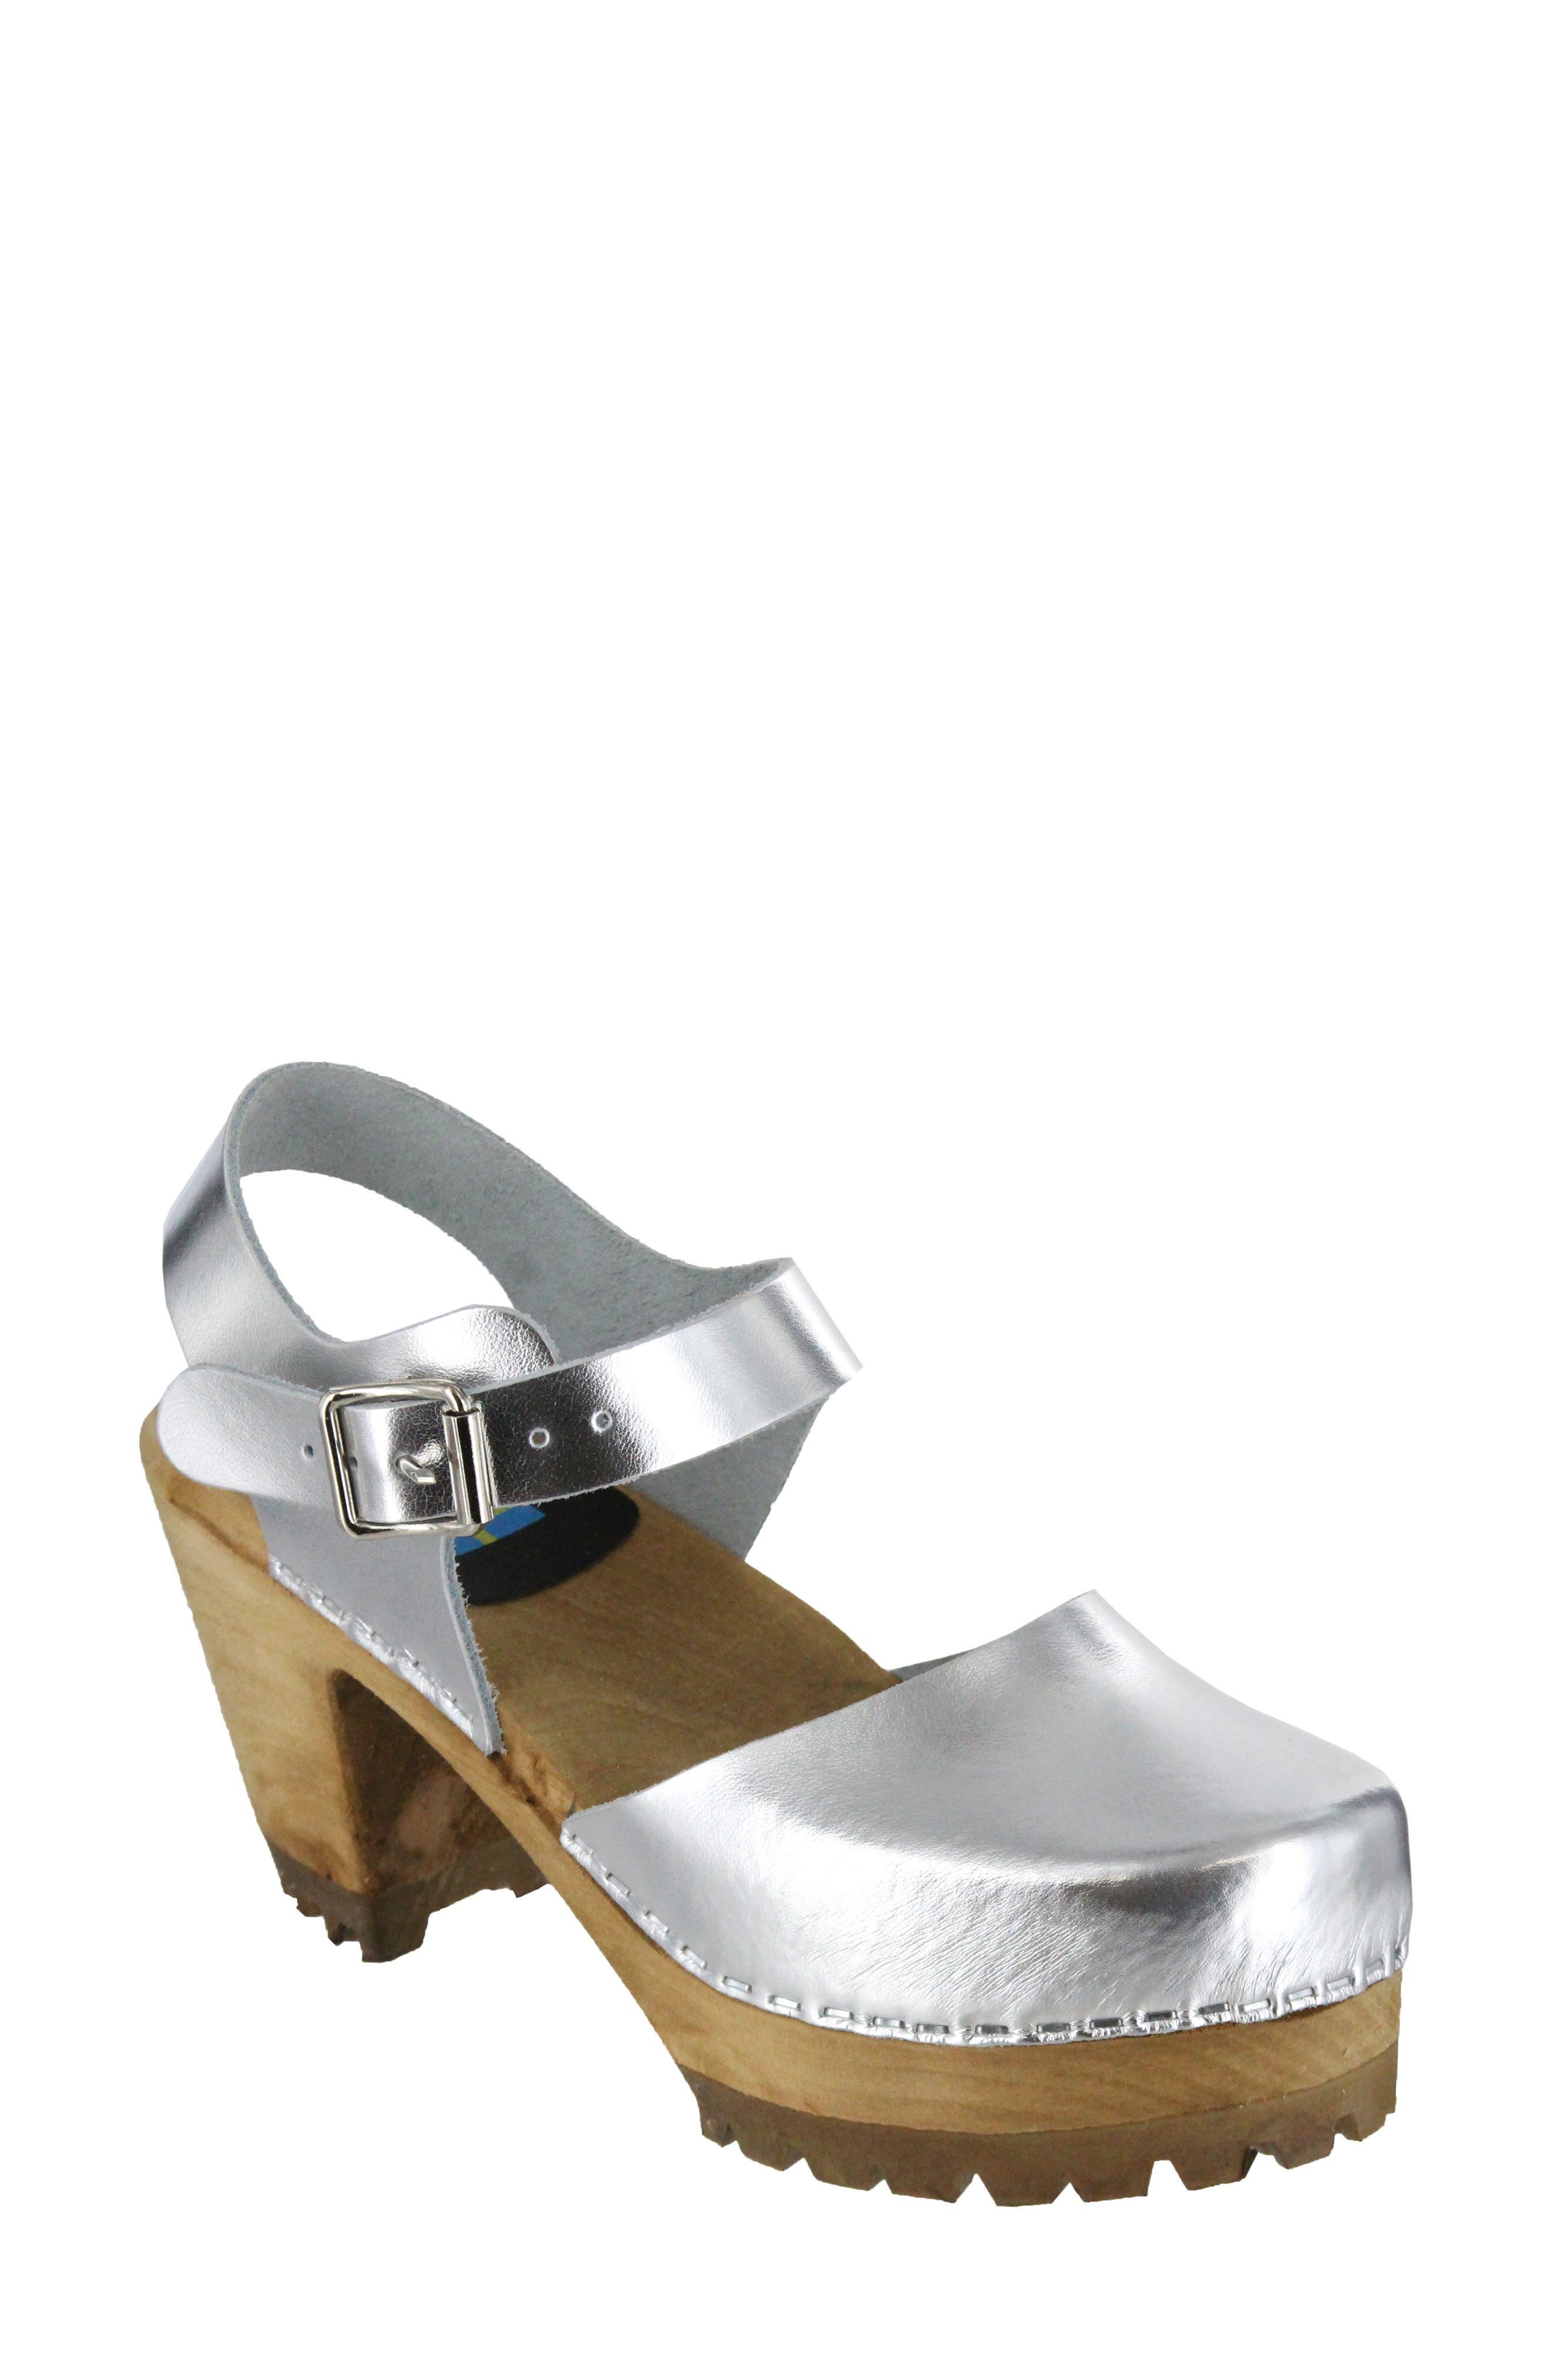 Abba Sandal,                             Main thumbnail 1, color,                             Silver Leather